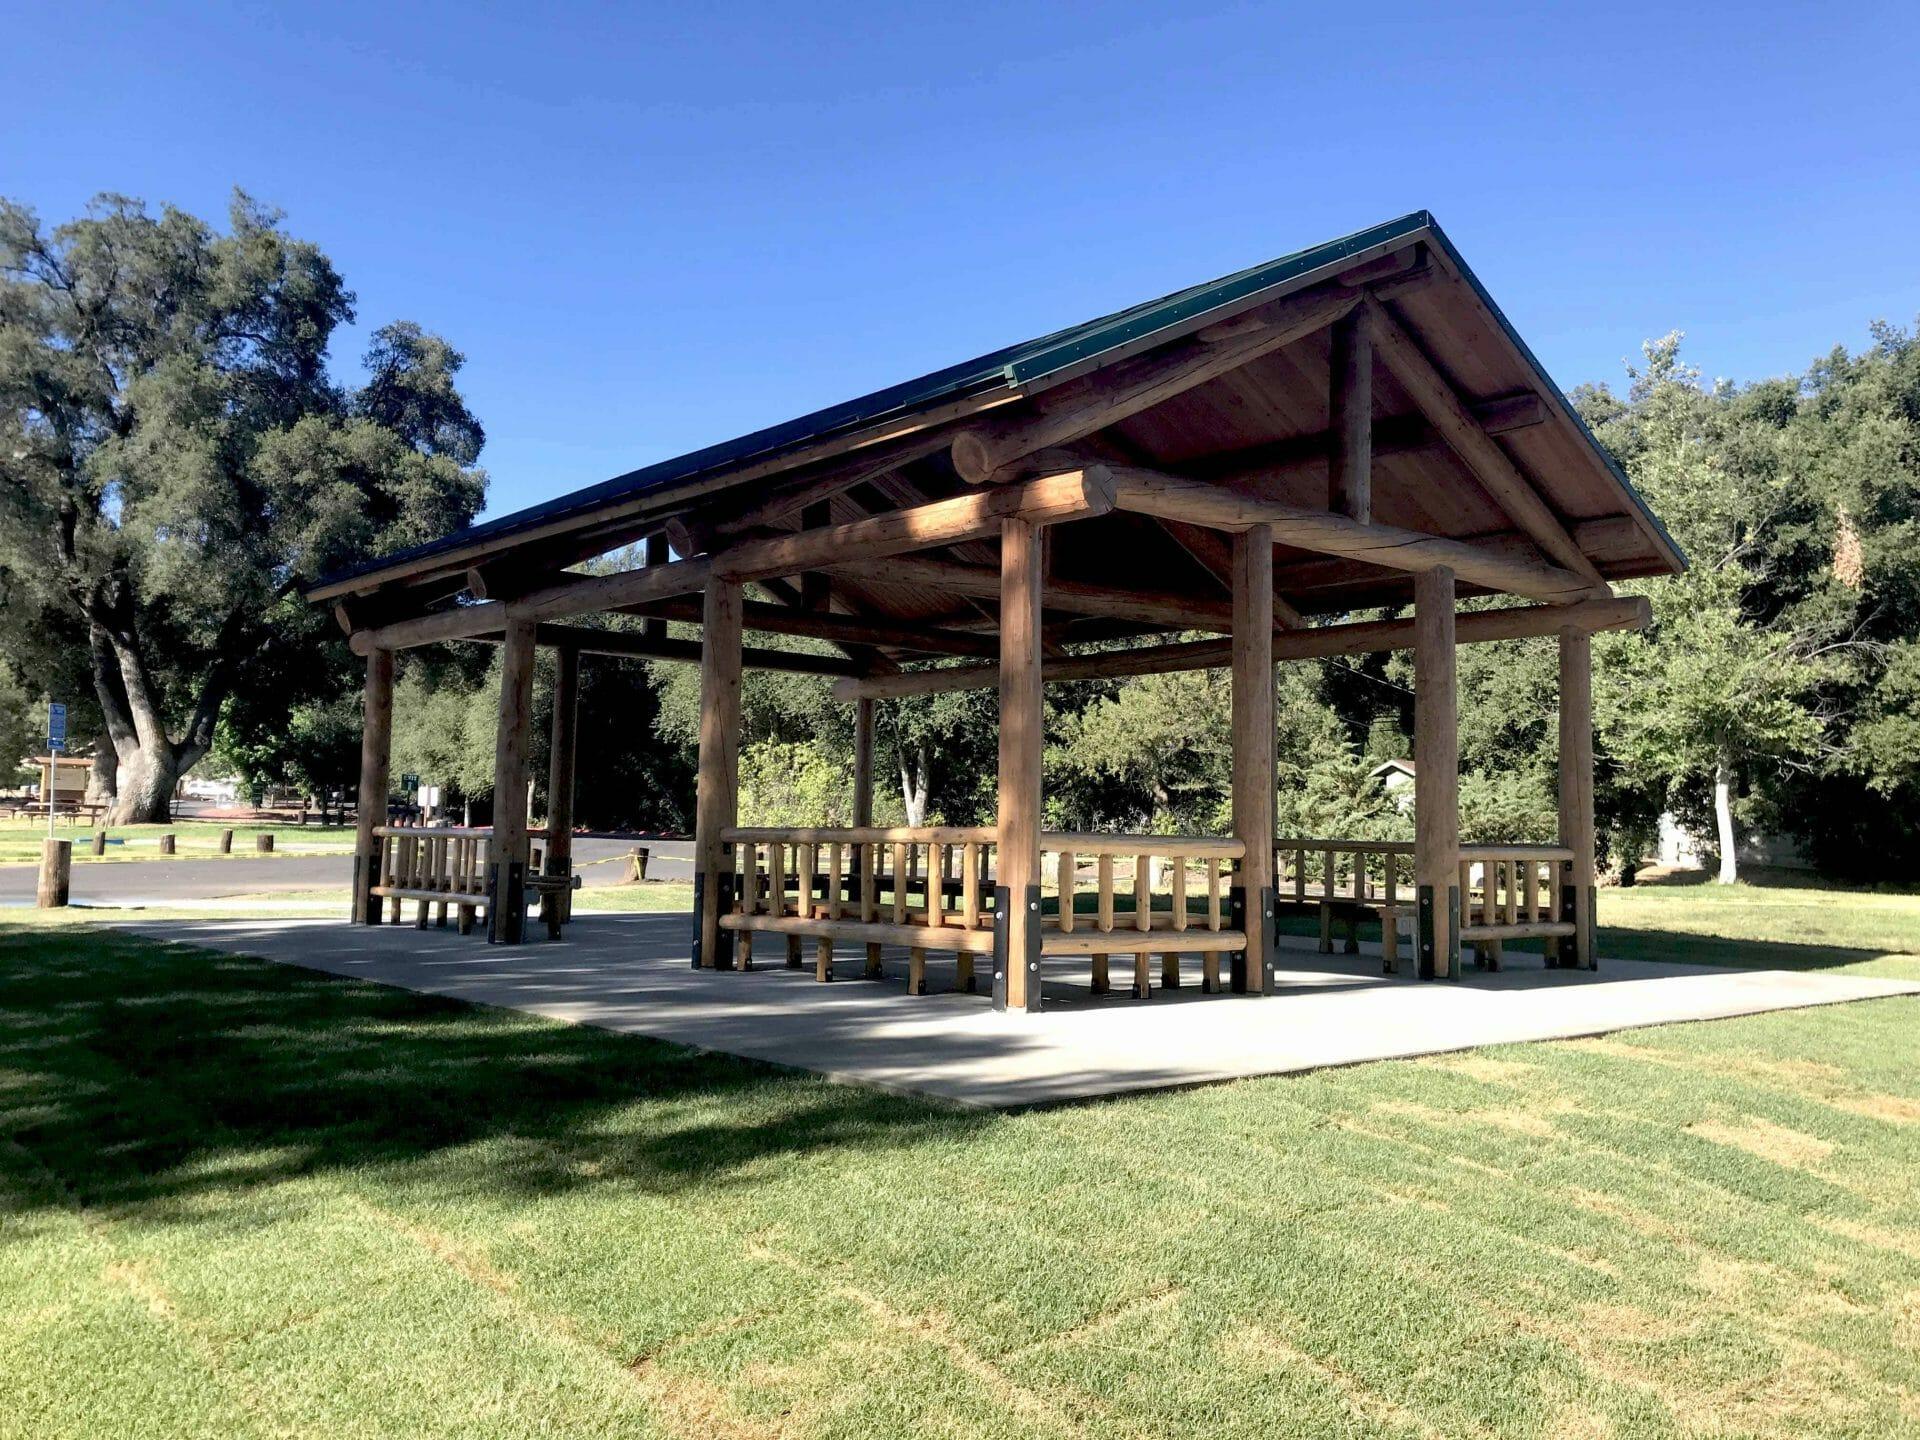 Large Log Pavilion with Side Railing